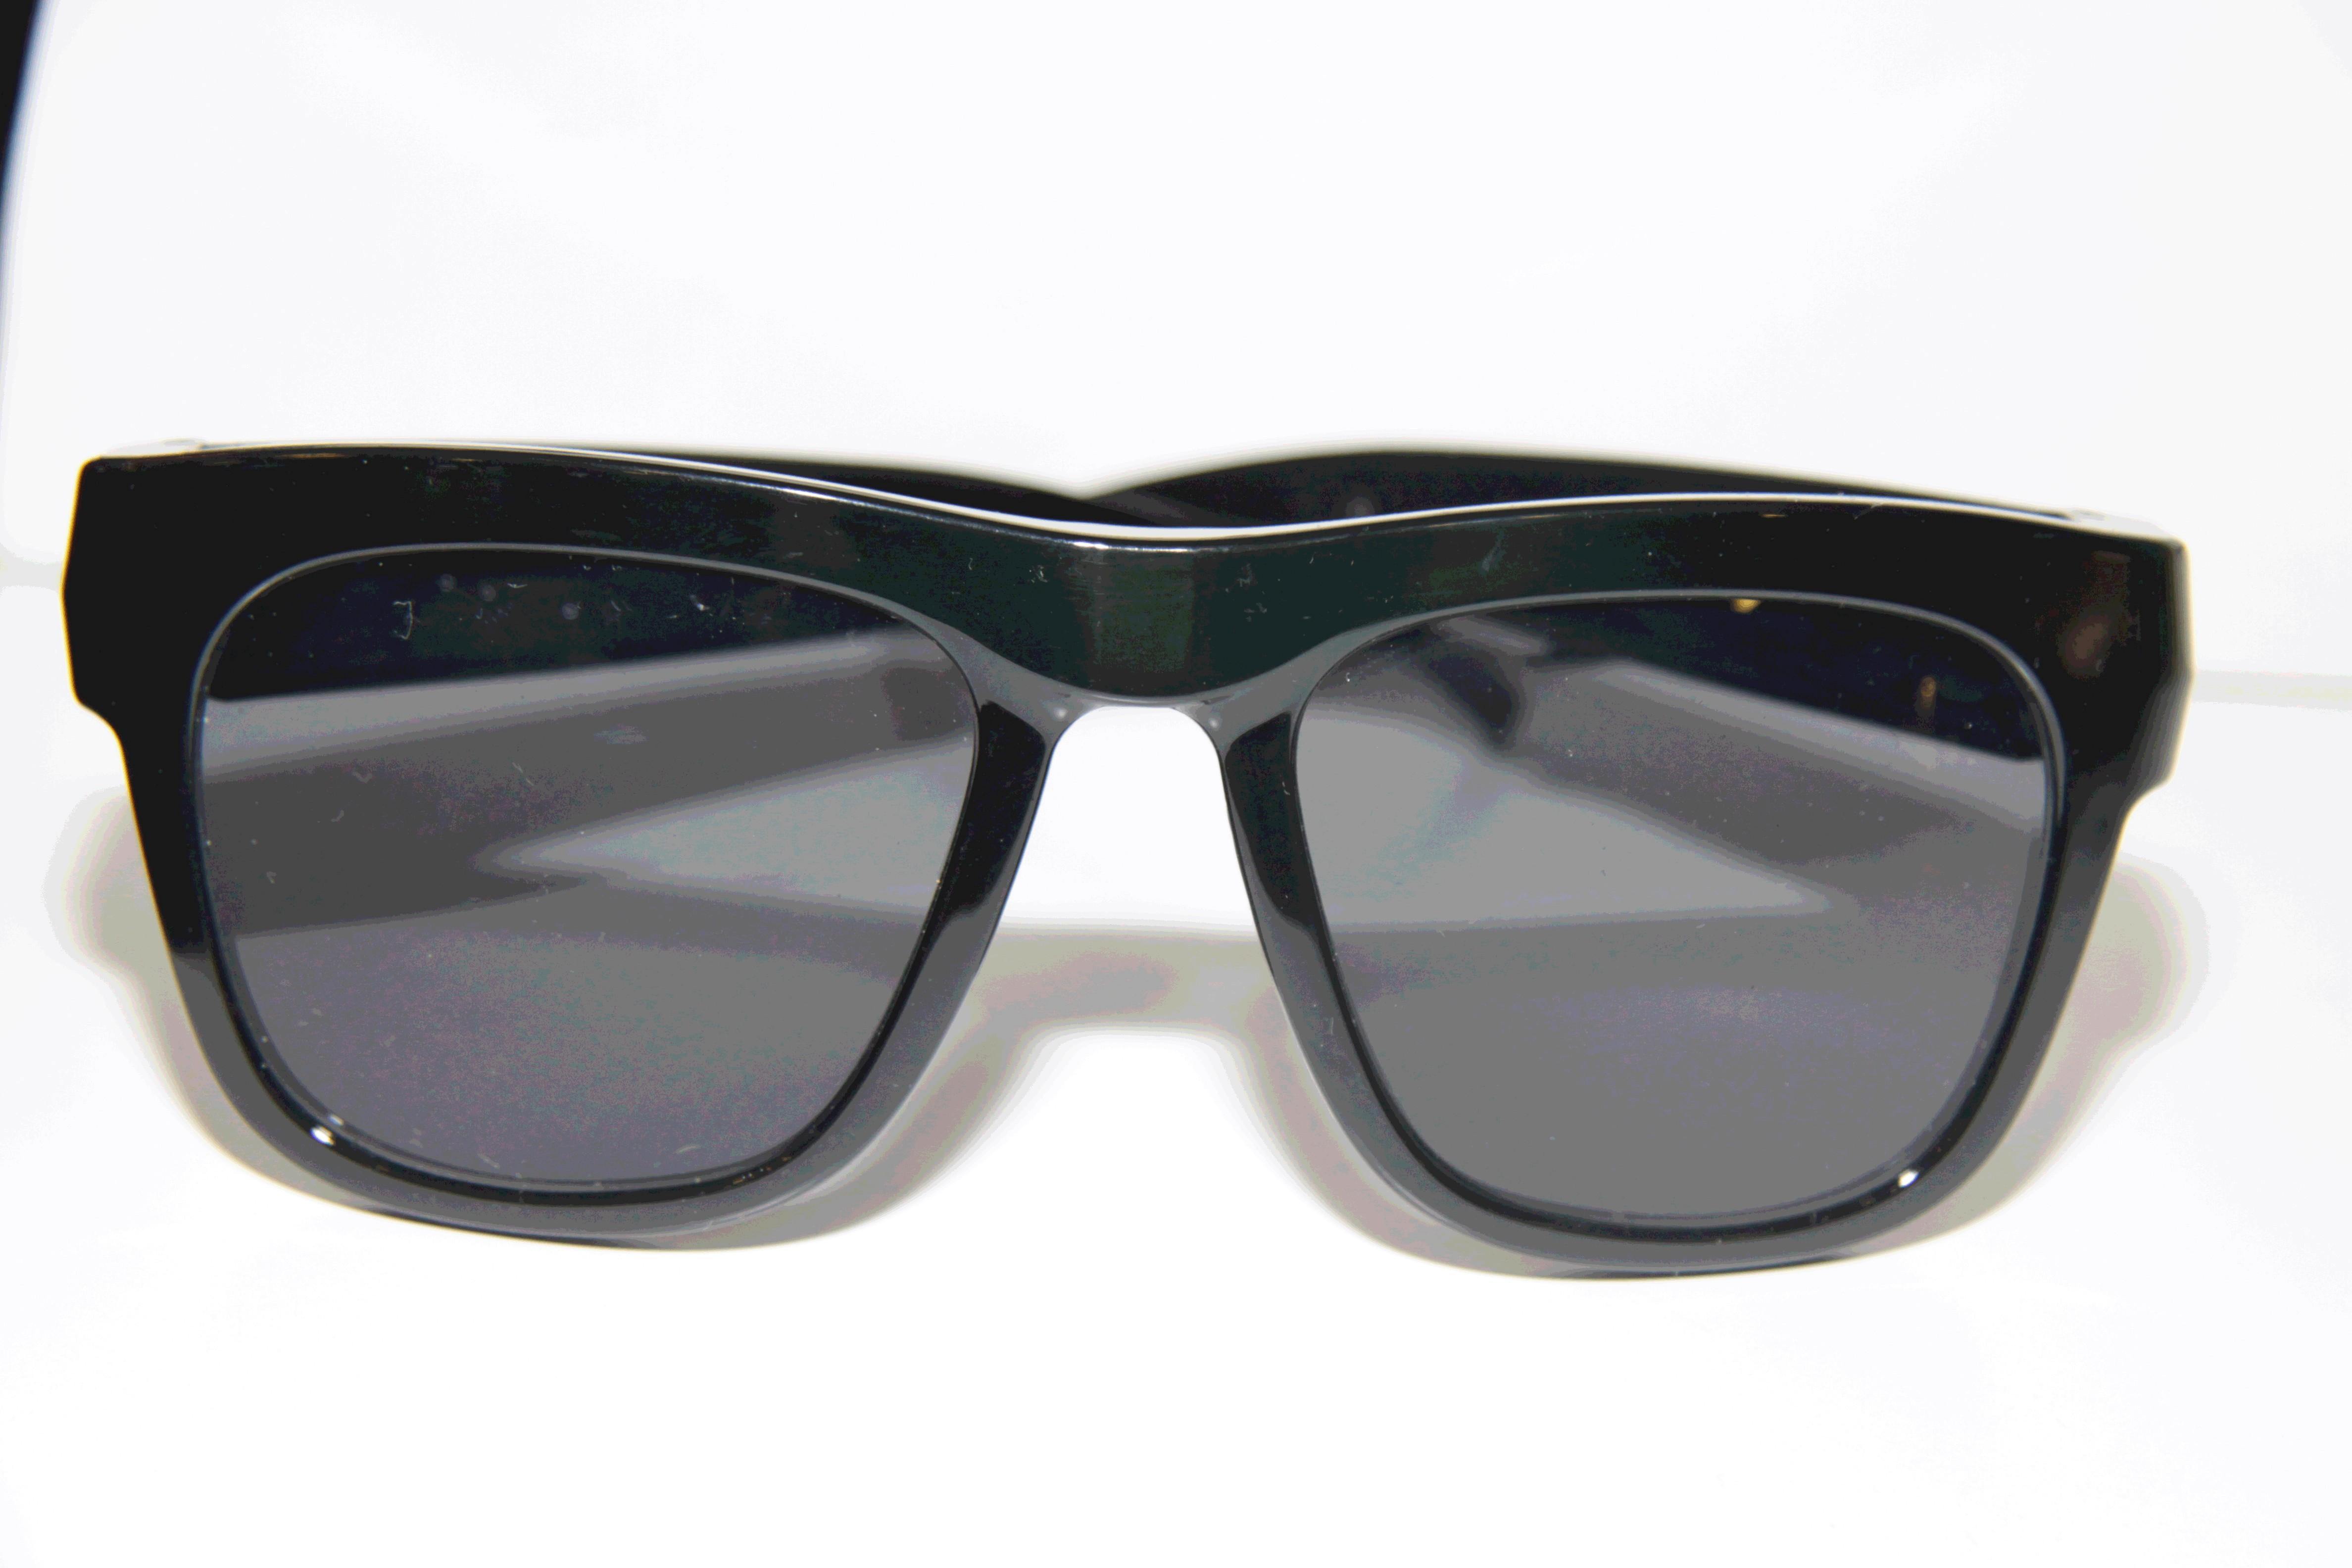 occhiale da sole spia